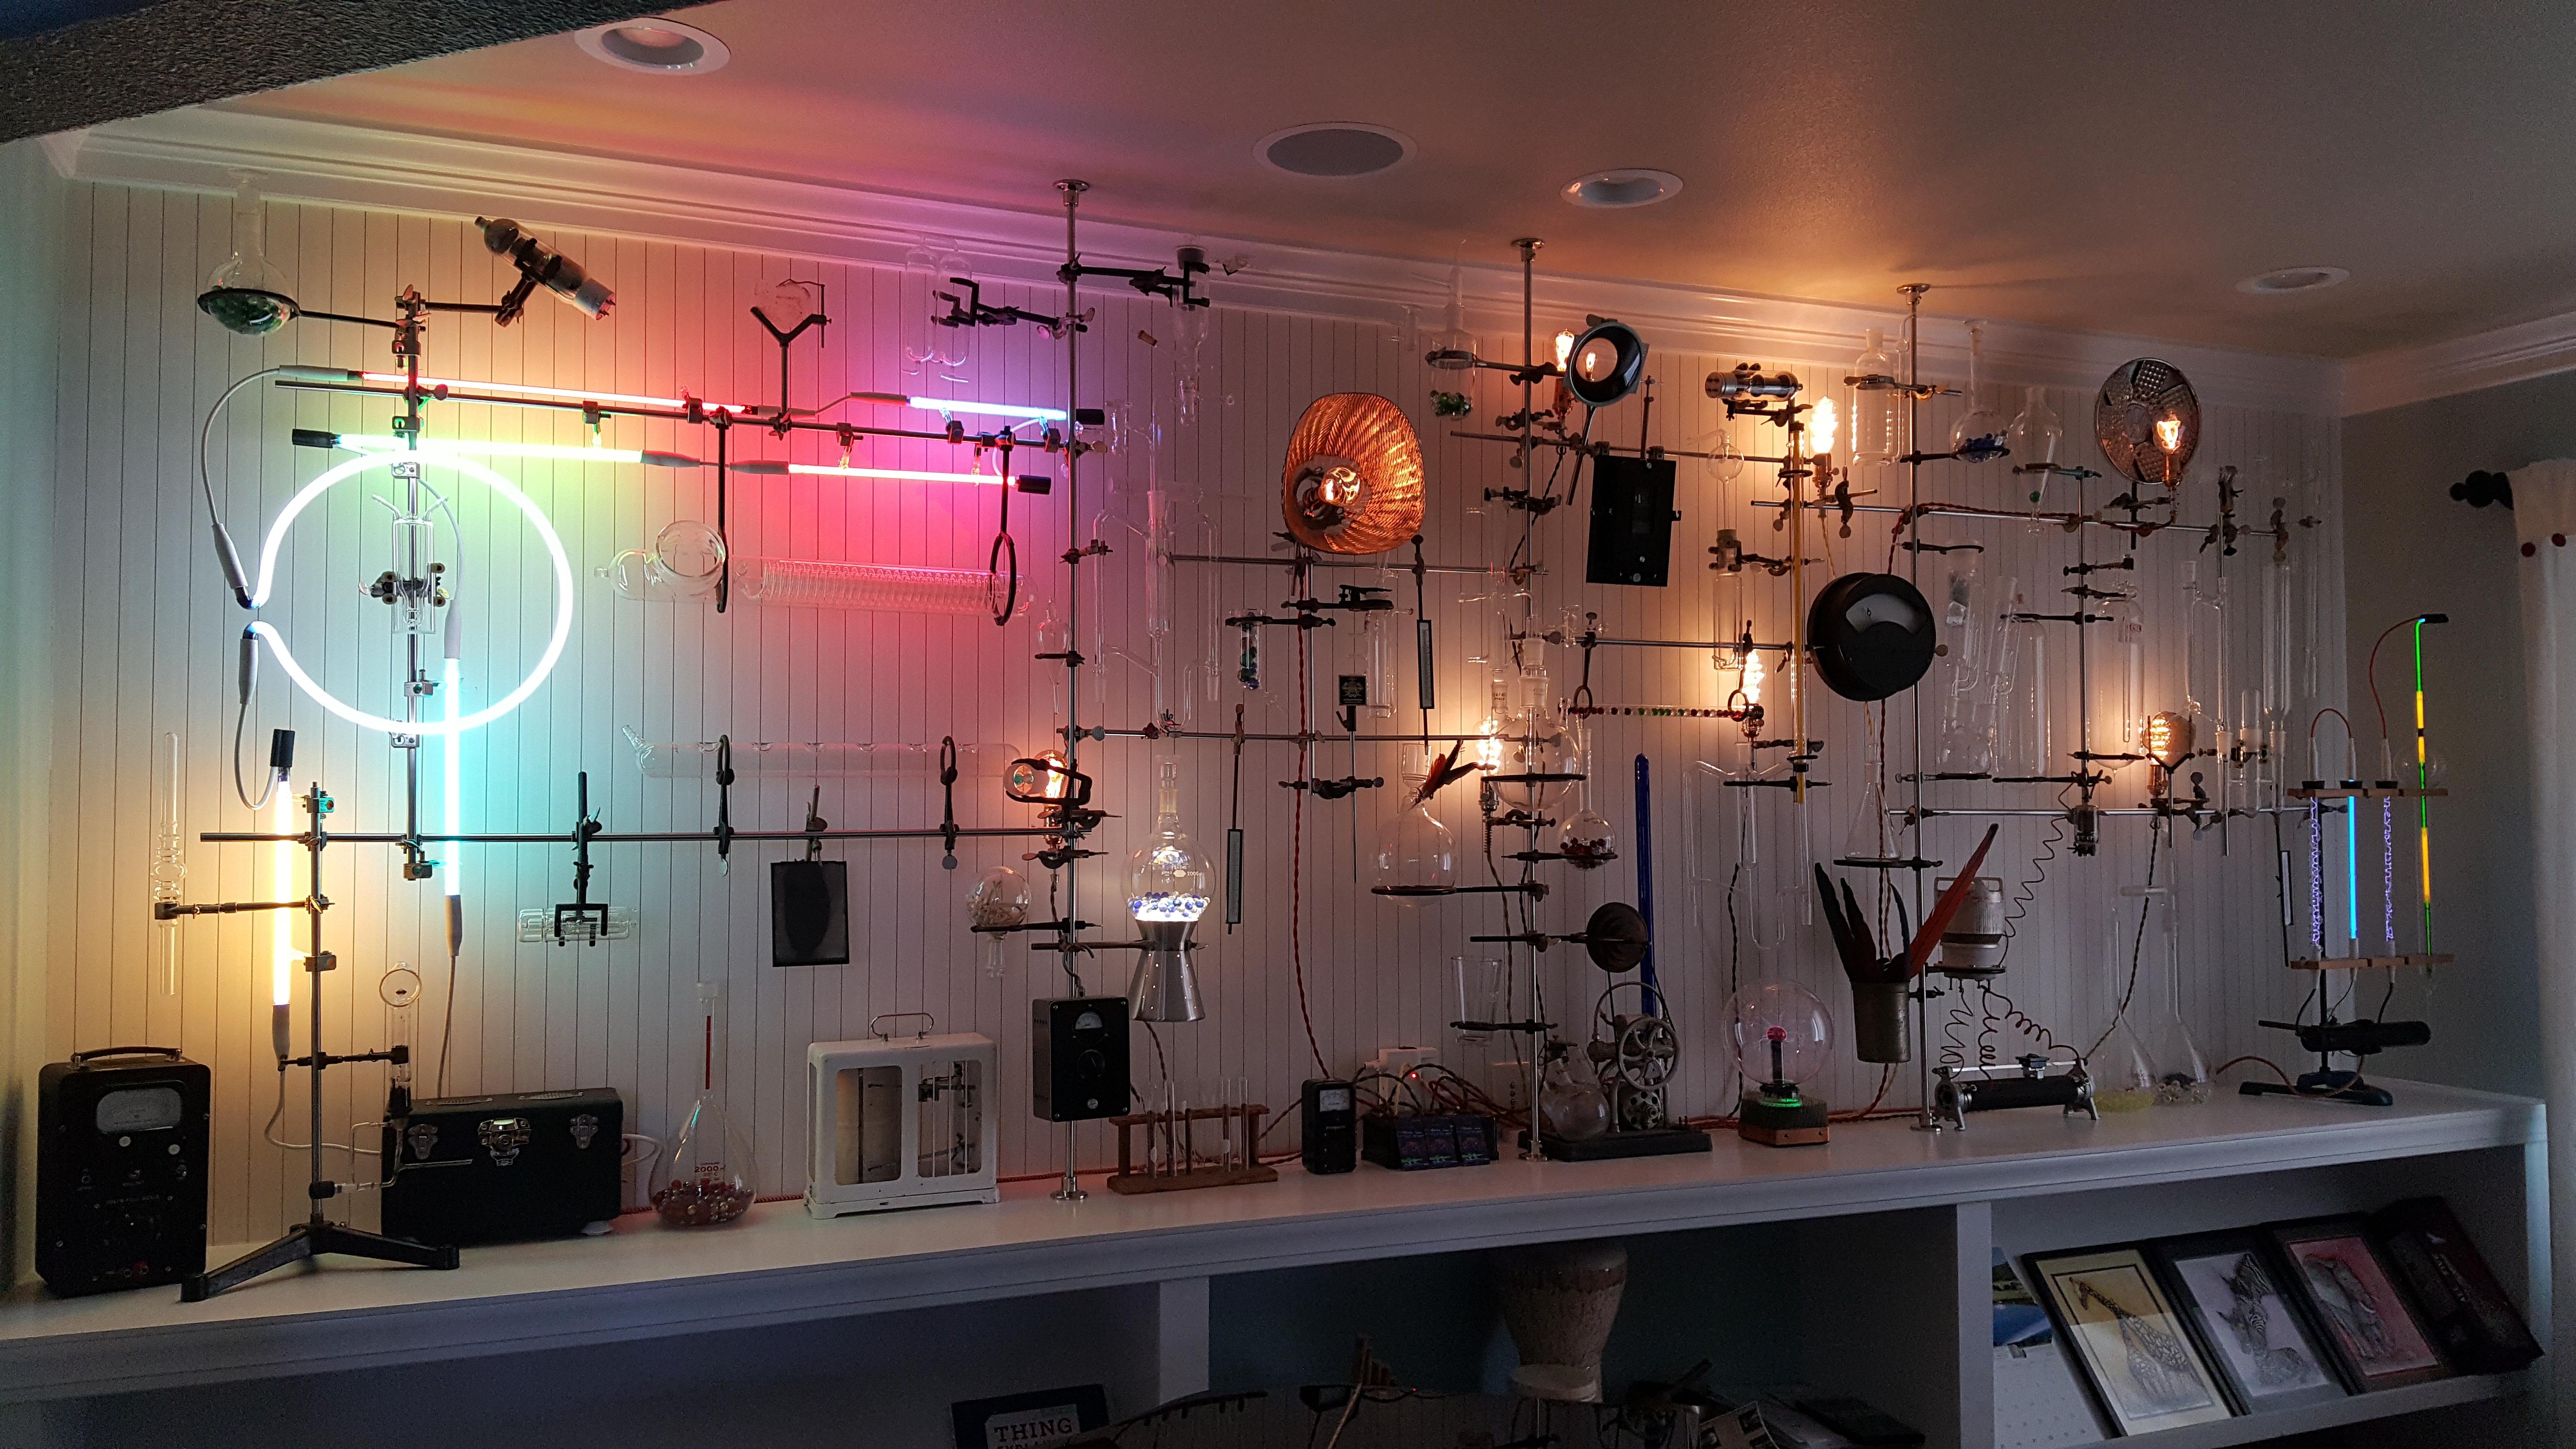 Colorado Springs Co residential Laboratory installation